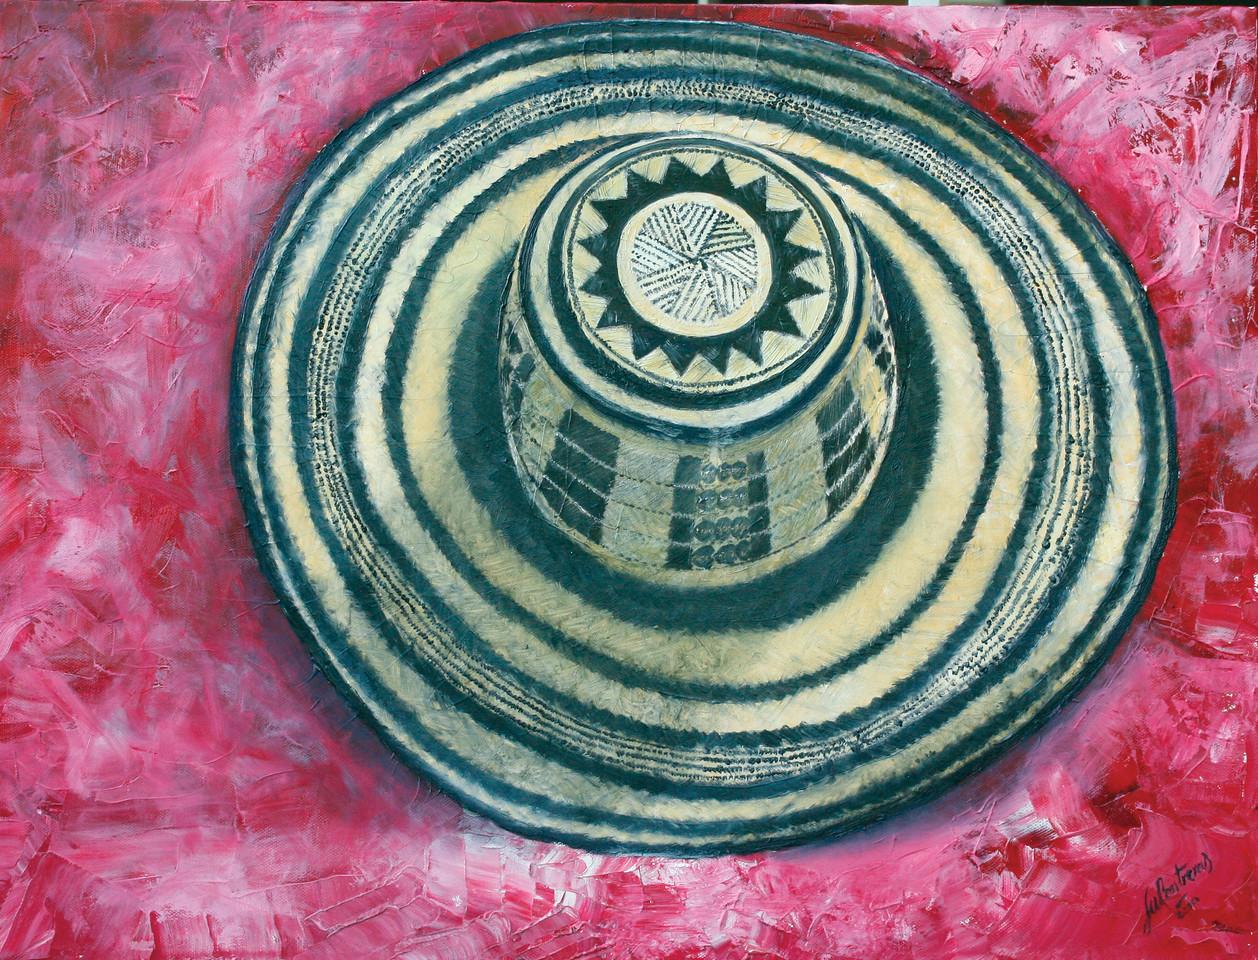 Sombrero Vueltio, 2008